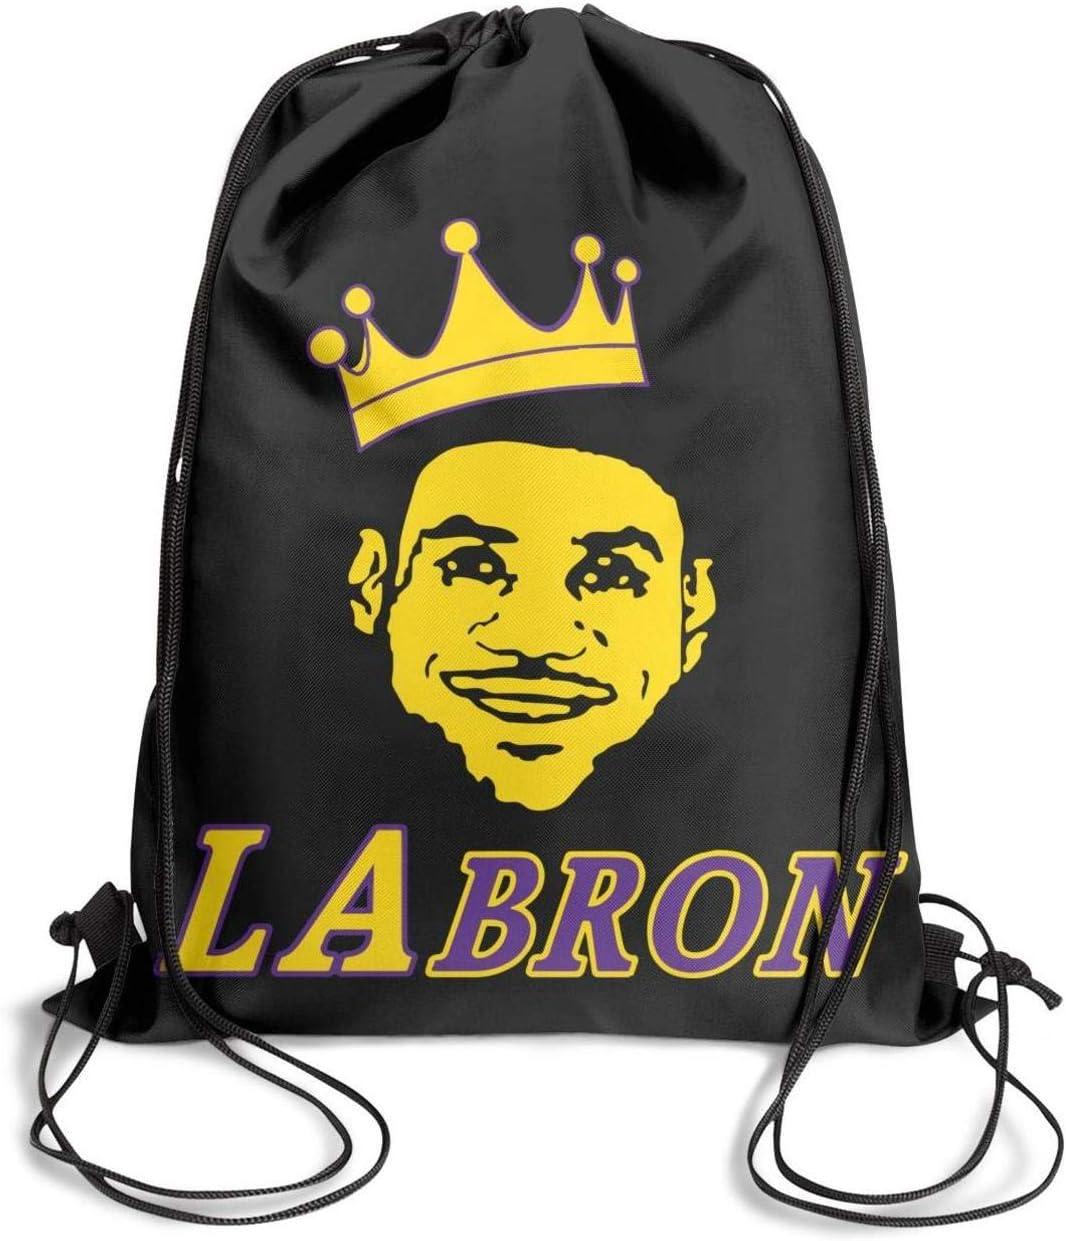 GUYI3 Handbags Polyester Personalized 23-Labron-King Drawstring Bags for Women /& Men